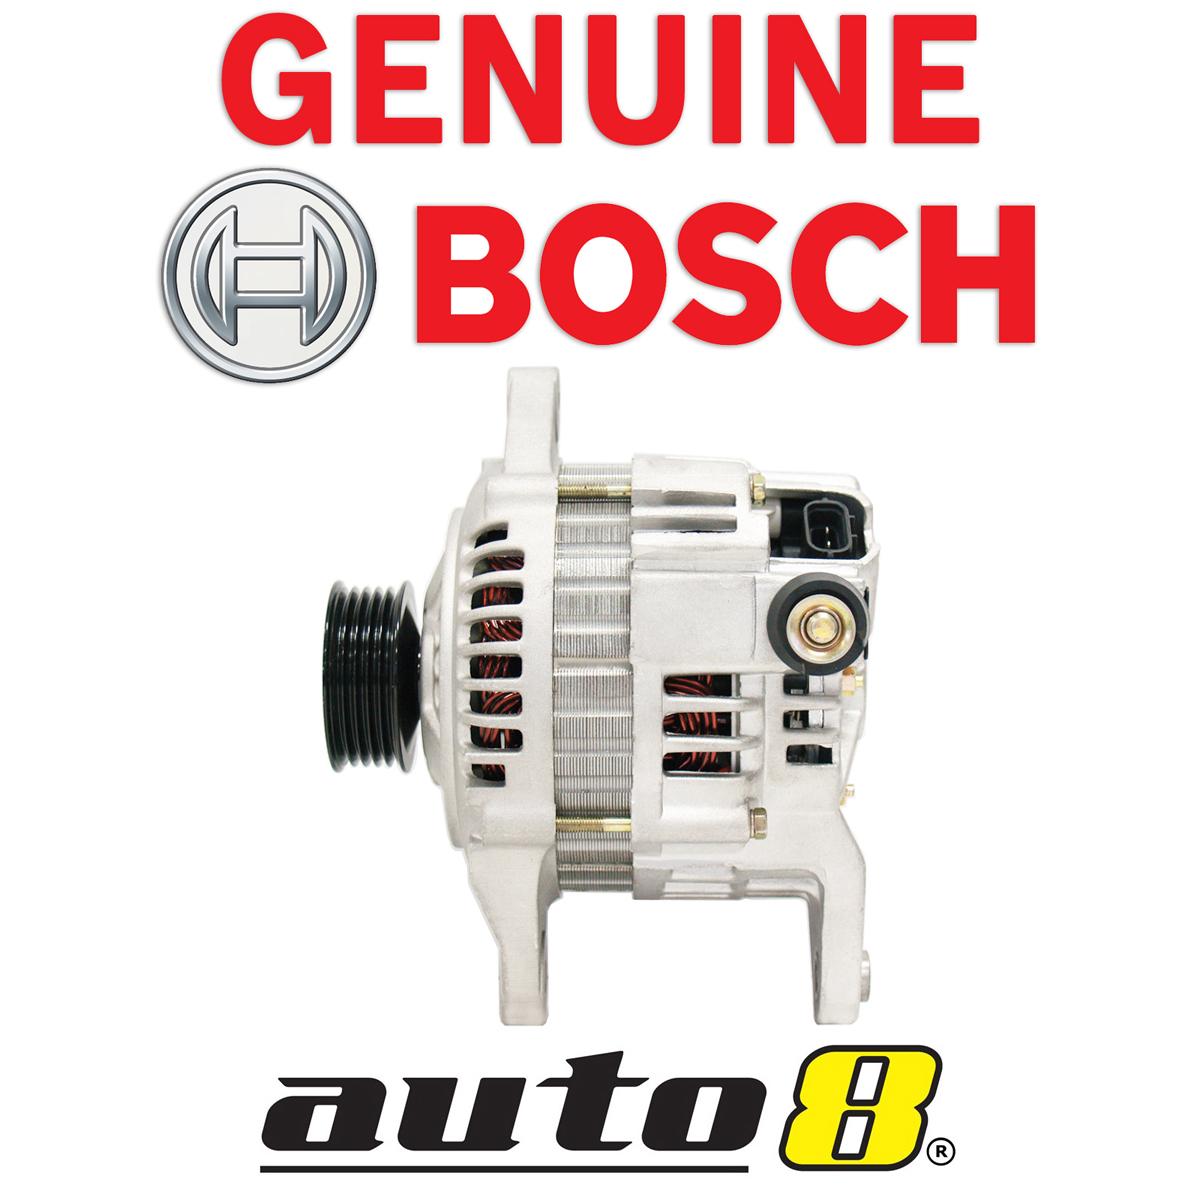 Genuine-Bosch-Alternator-fits-Subaru-Impreza-GE-GH-2-0L-Petrol-EJ20-2007-2011